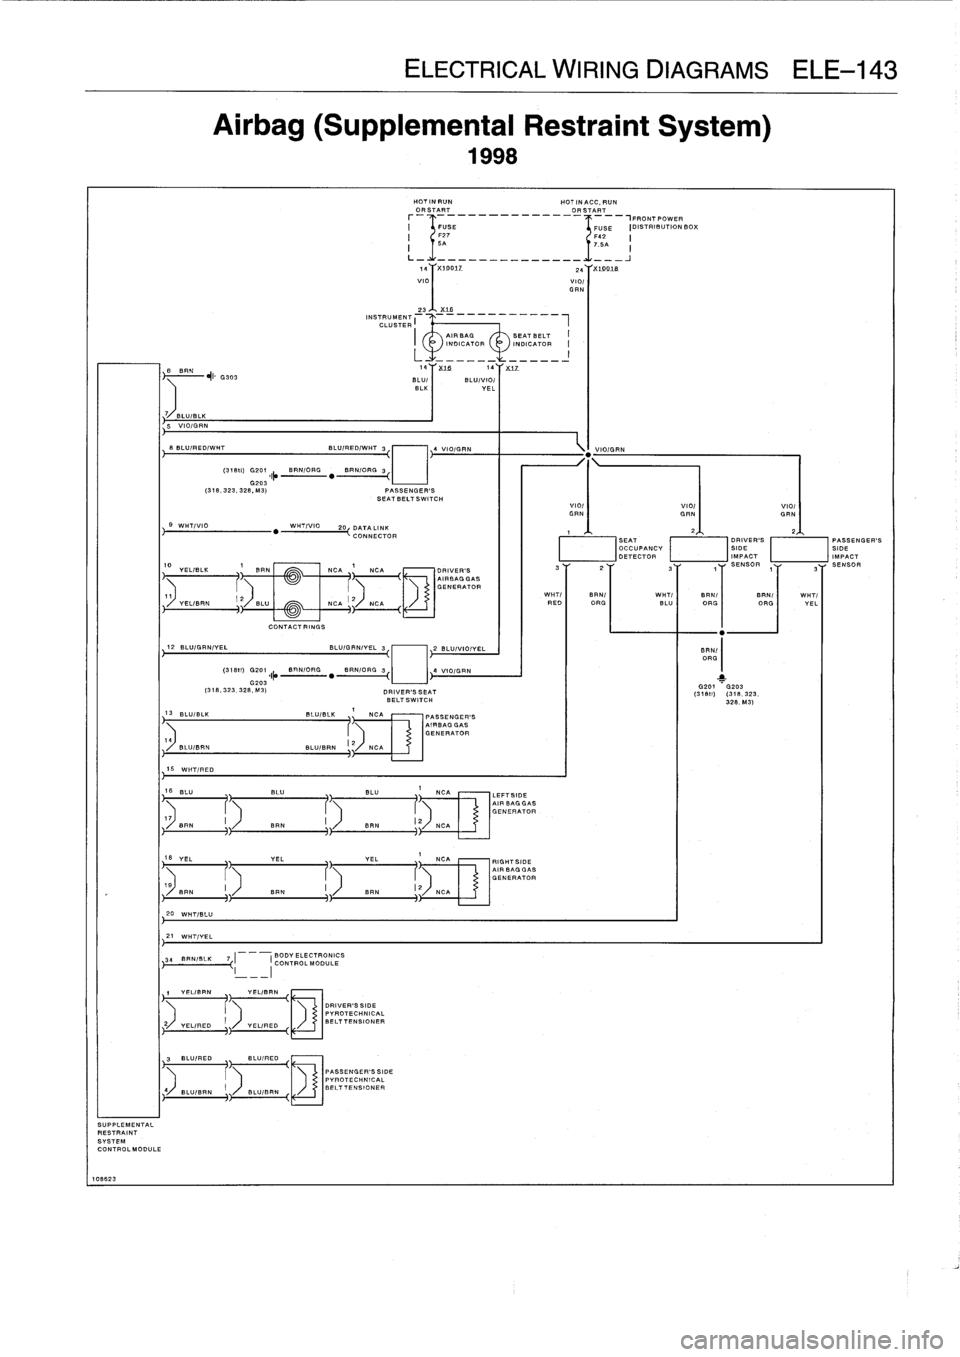 Bmw M3 1992 E36 Workshop Manual Airbag Wiring Diagram